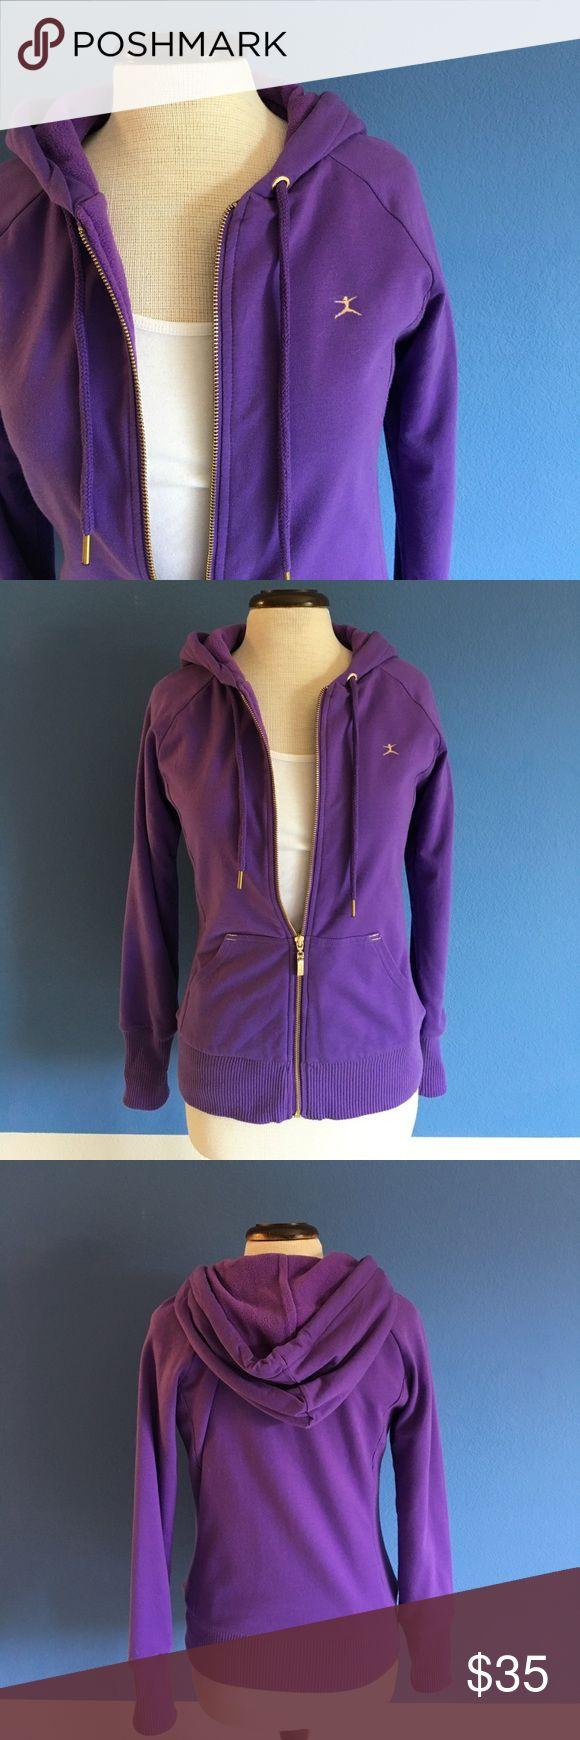 "Danskin Purple Hoodie Ready to workout?  You will be with this cute purple zippered hoodie.  Measurements: (Flat):  Length - 25""/Bust - 18""/Waist - 16"" Danskin Tops Sweatshirts & Hoodies"